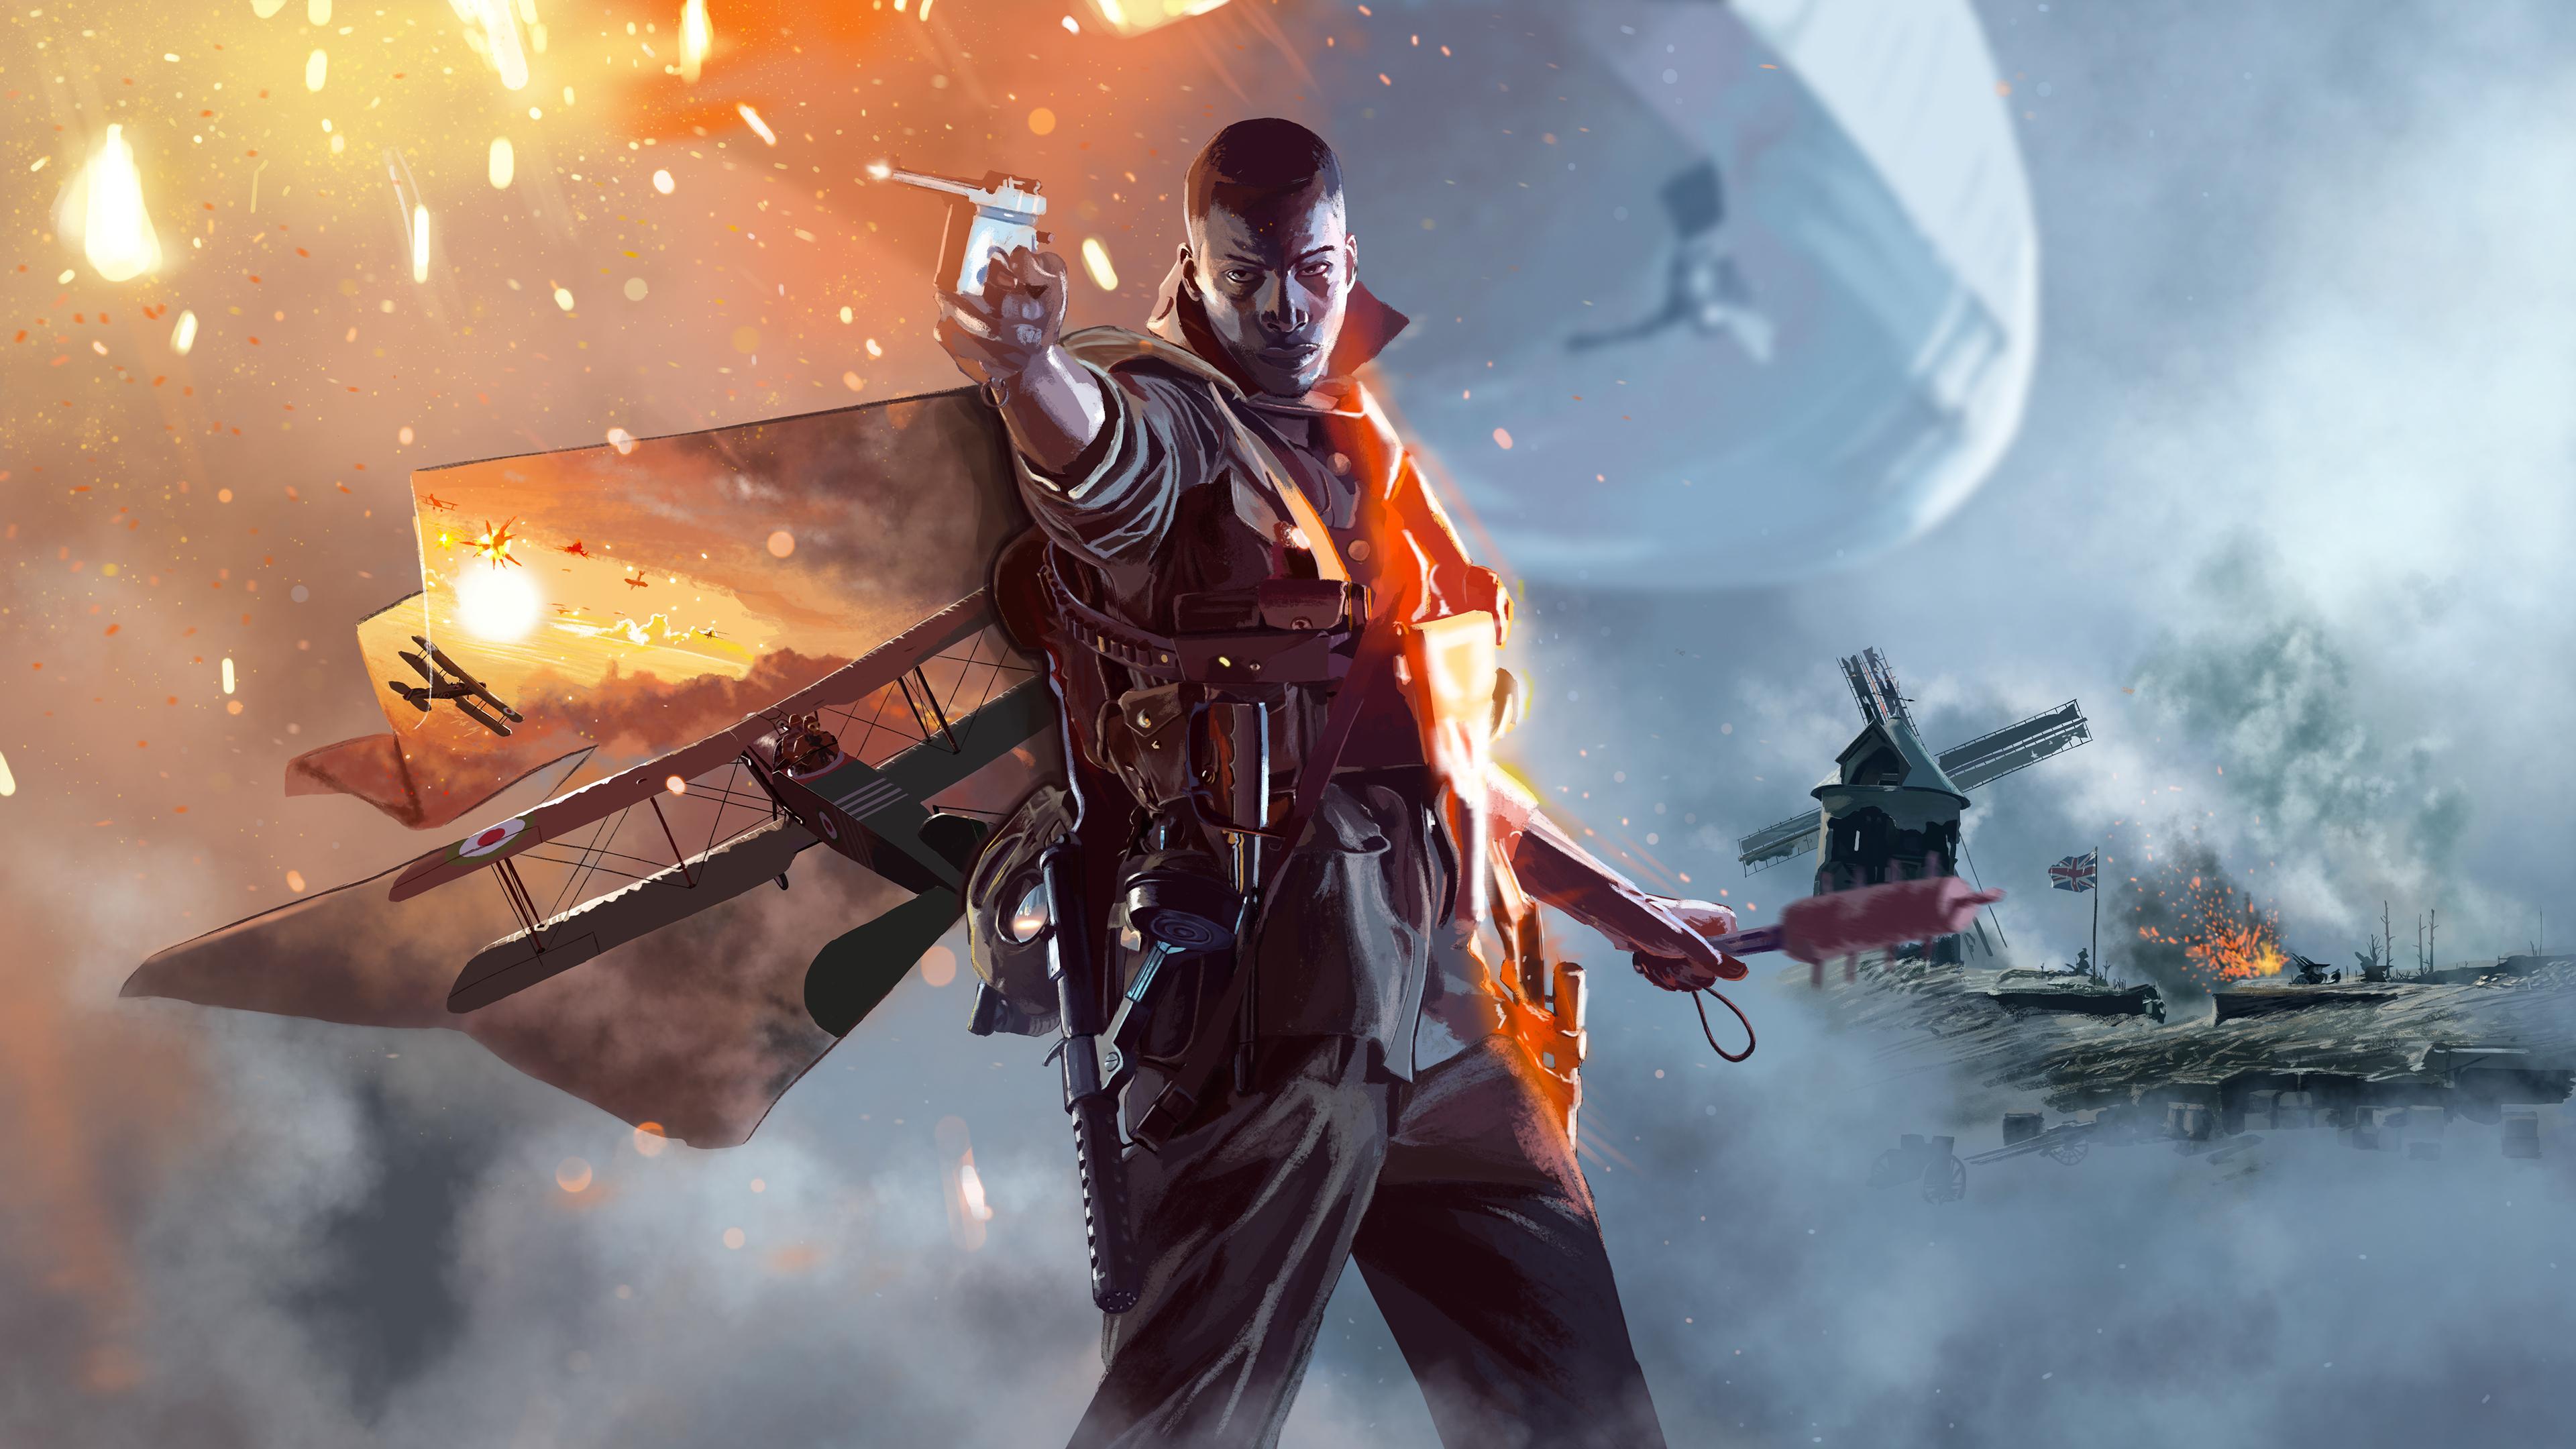 3840x2400 Battlefield 1 Illustration 4k HD 4k Wallpapers ...